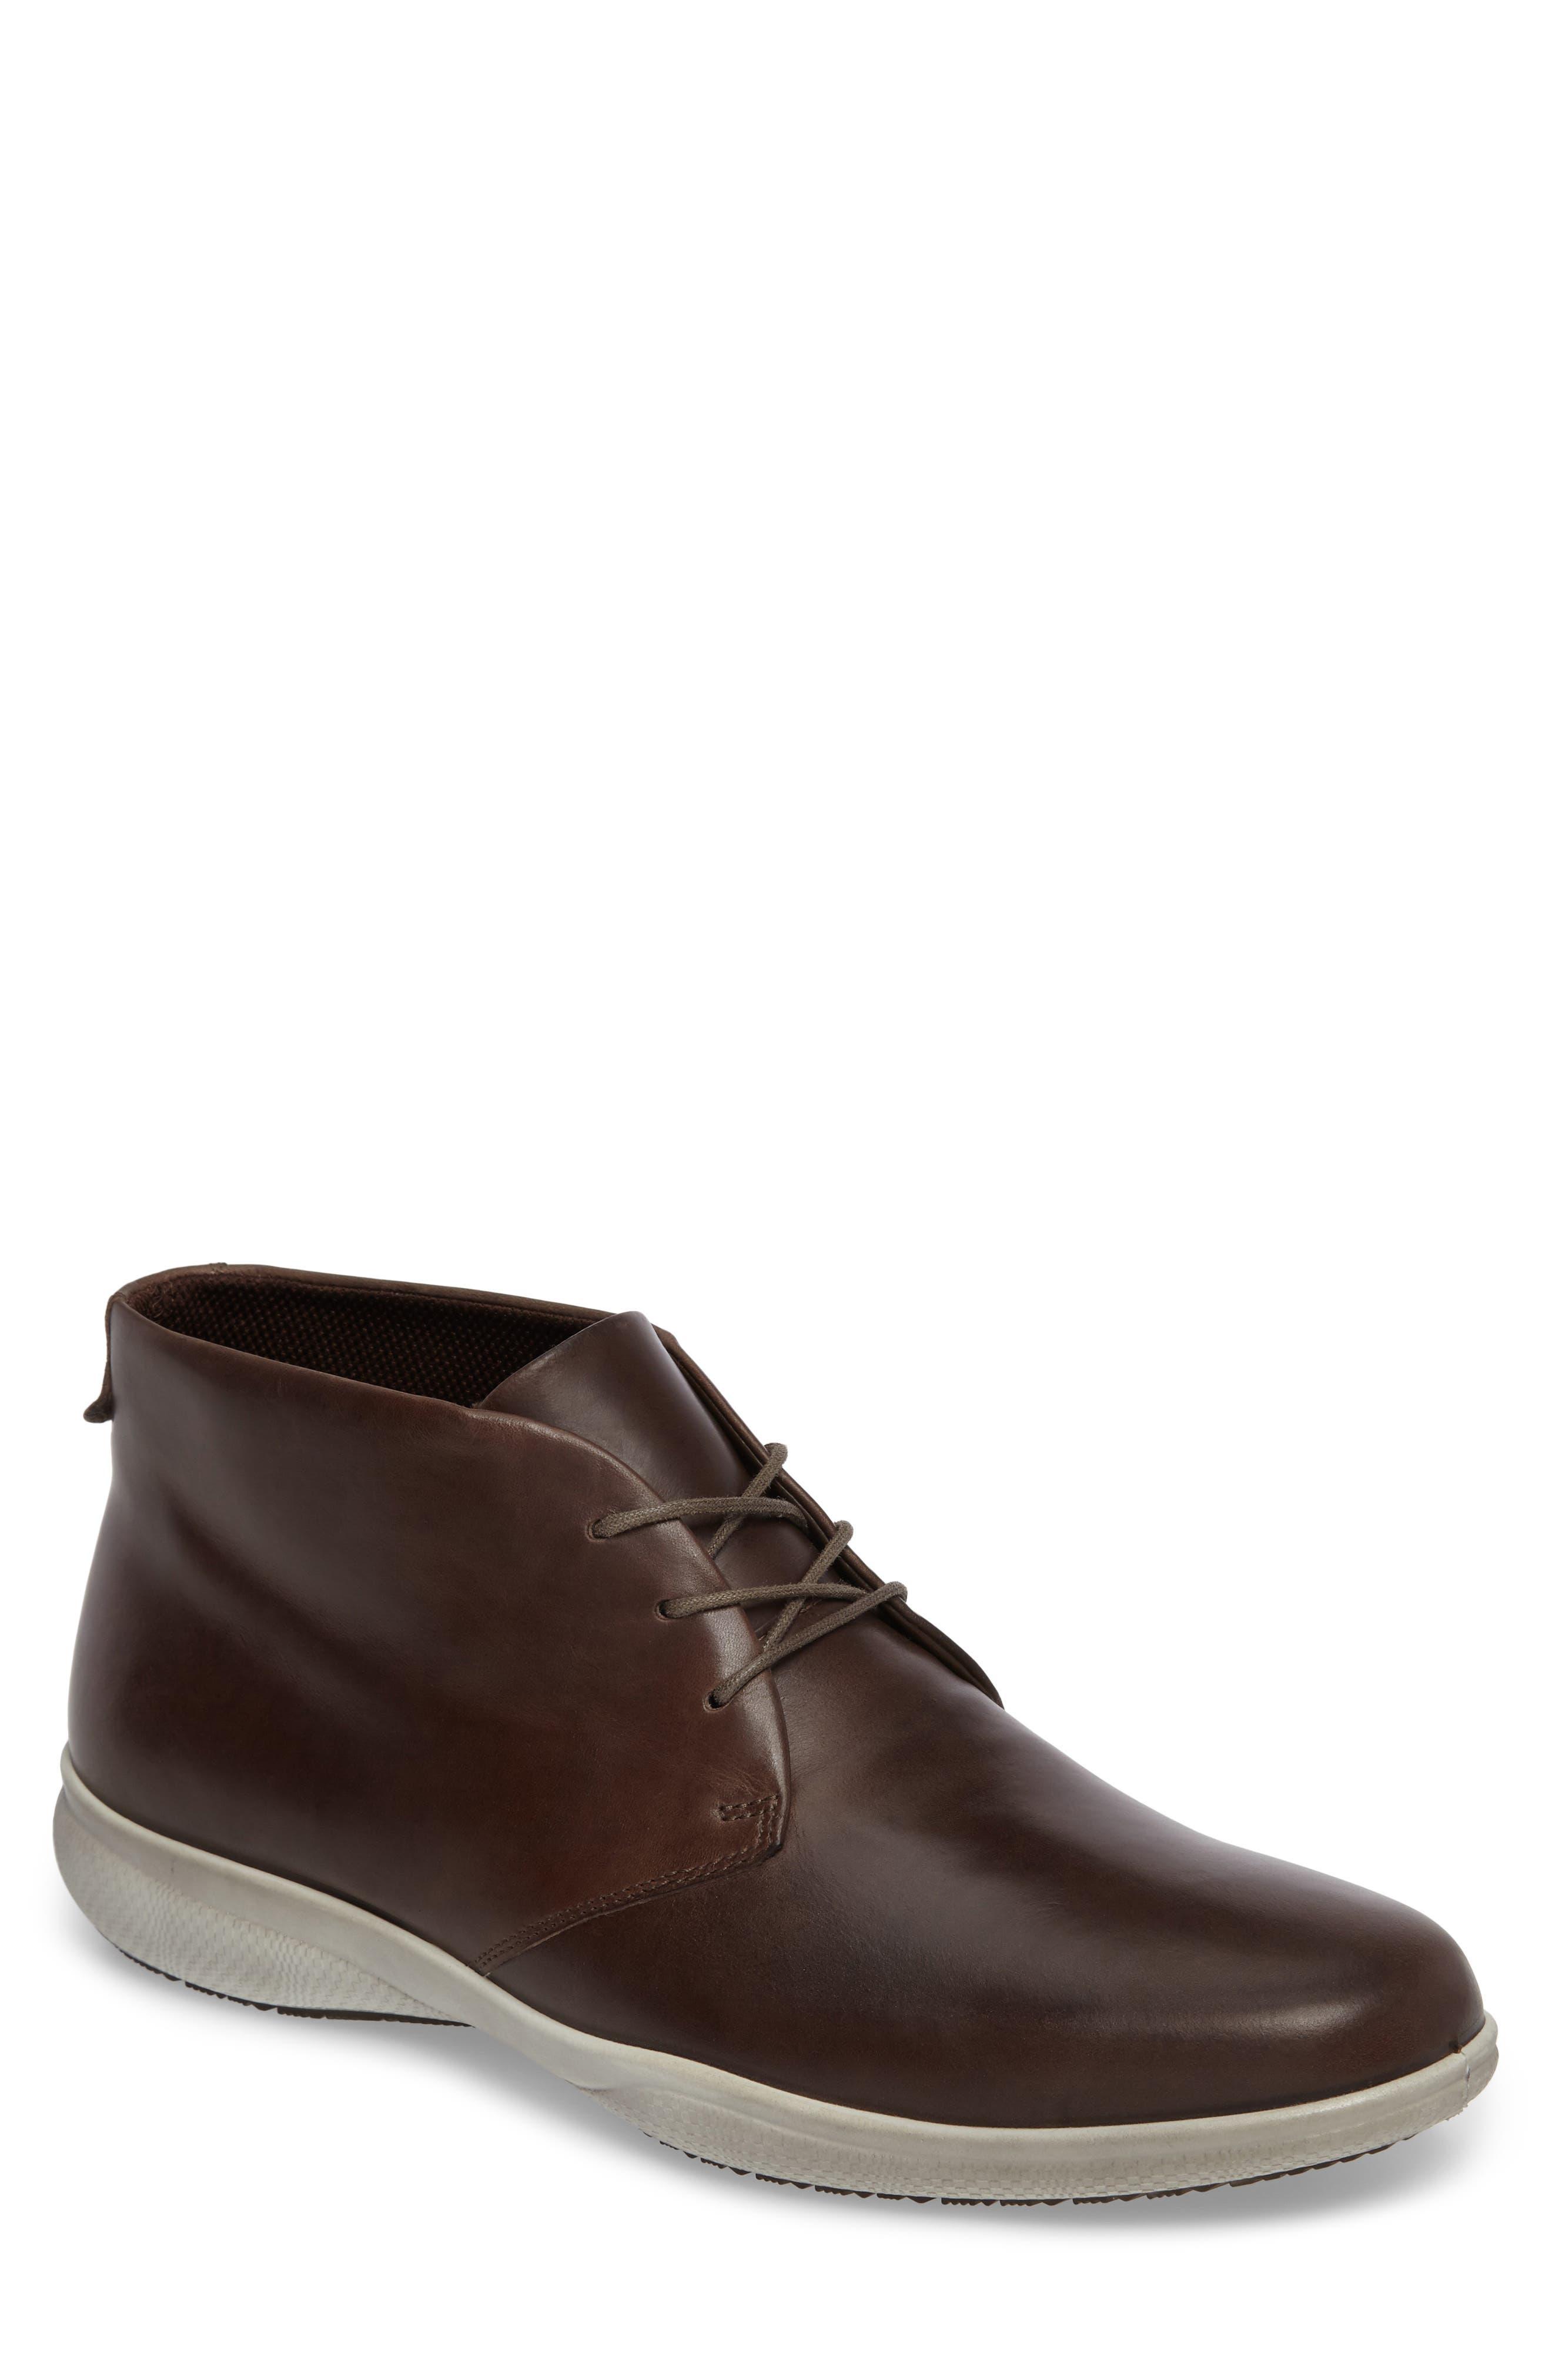 Main Image - ECCO 'Grenoble' Chukka Boot (Men)